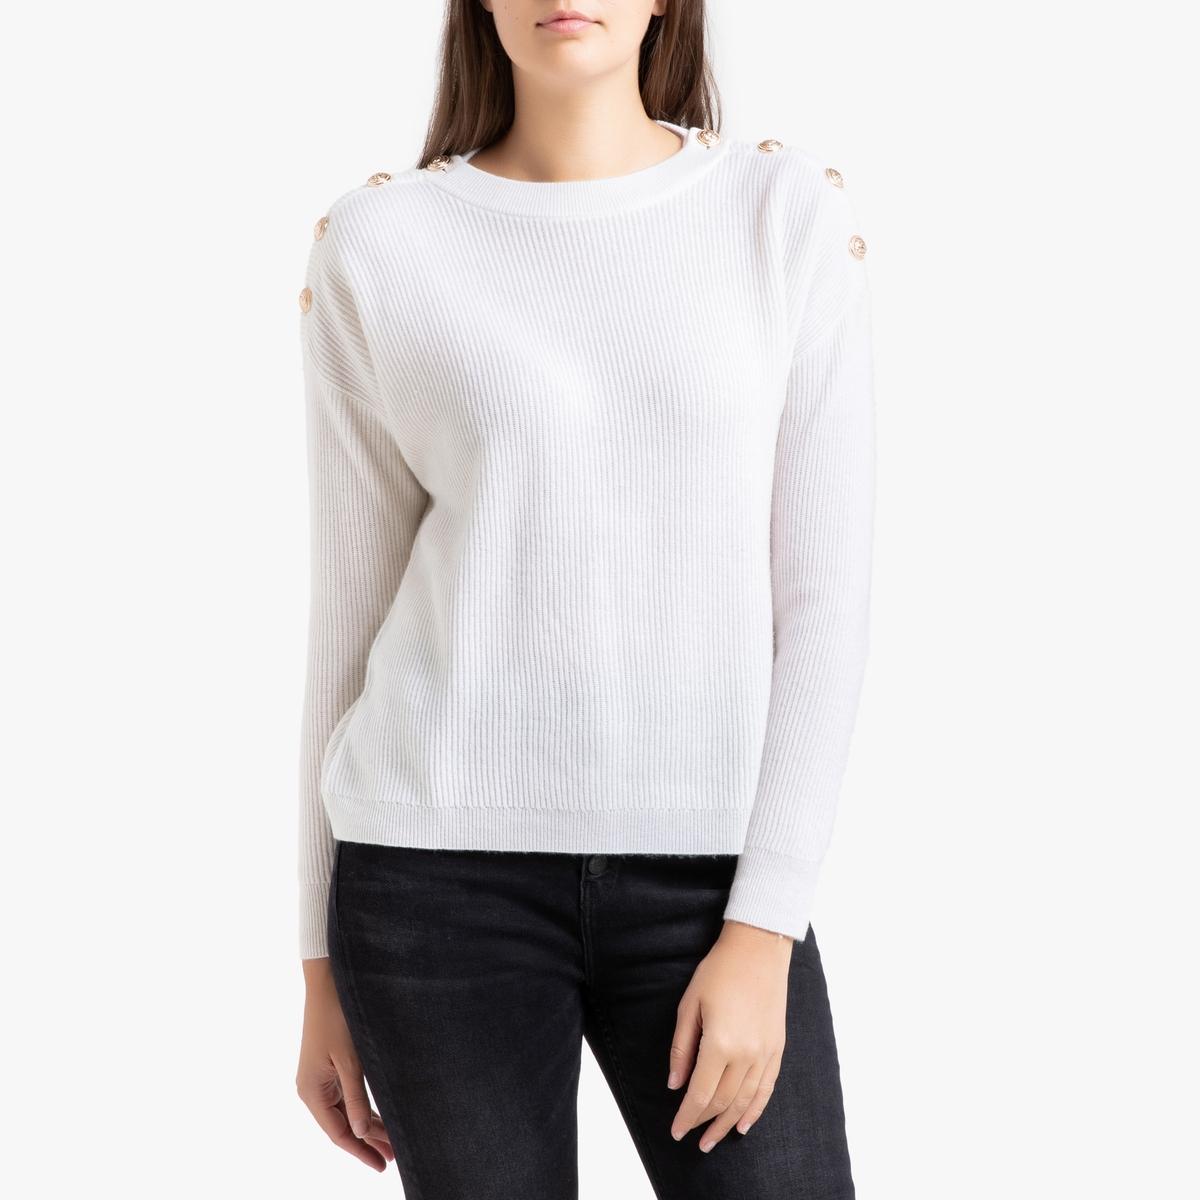 Пуловер La Redoute Из кашемира 3(L) бежевый ic men коричневый пуловер из кашемира